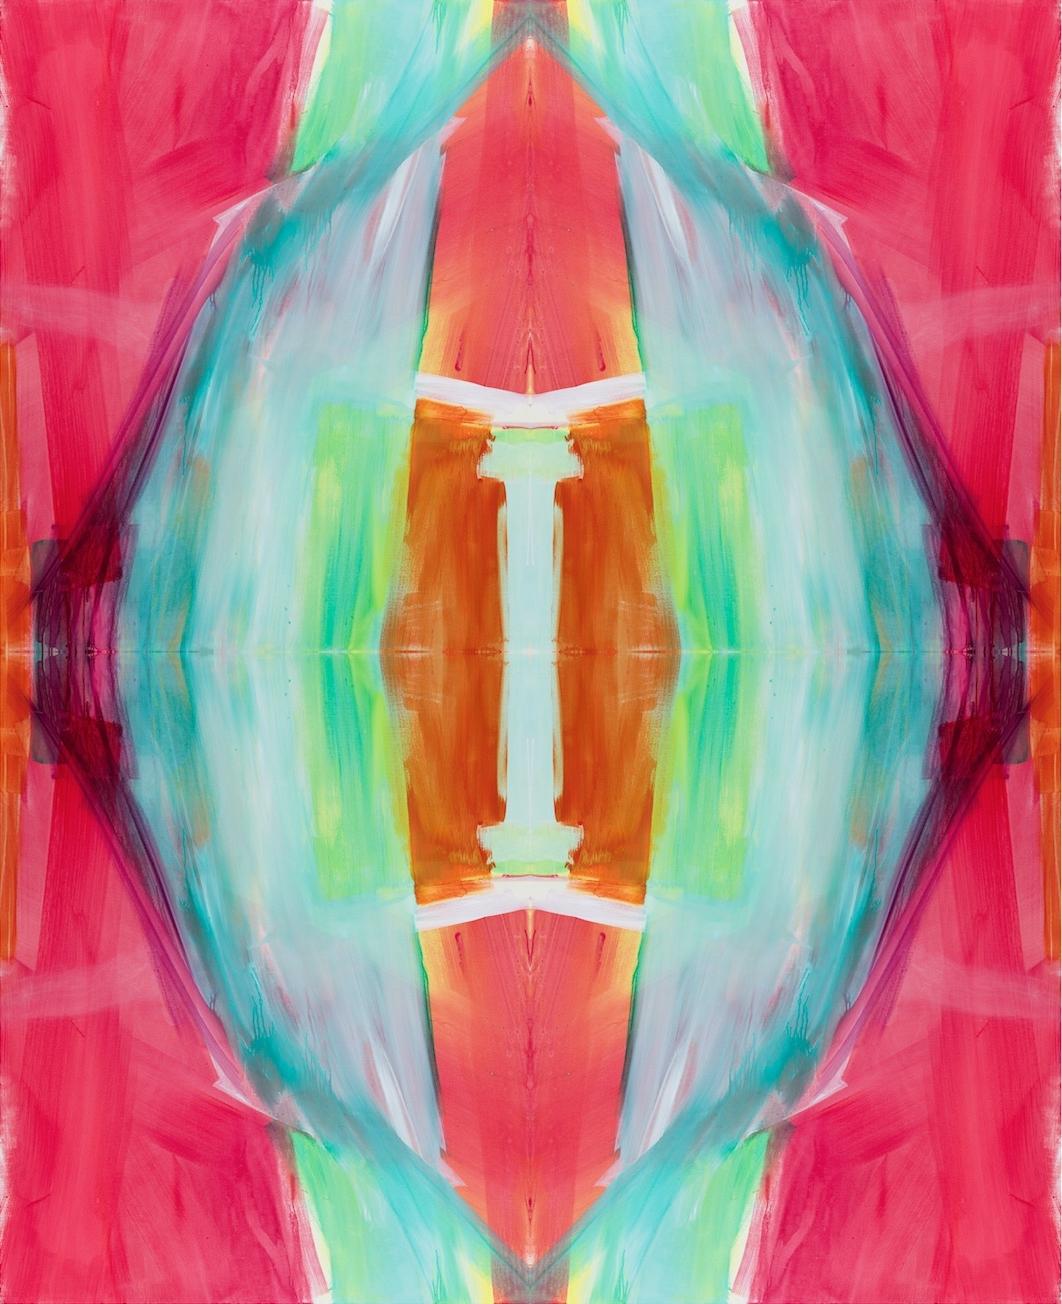 Shard of Light (inhale)